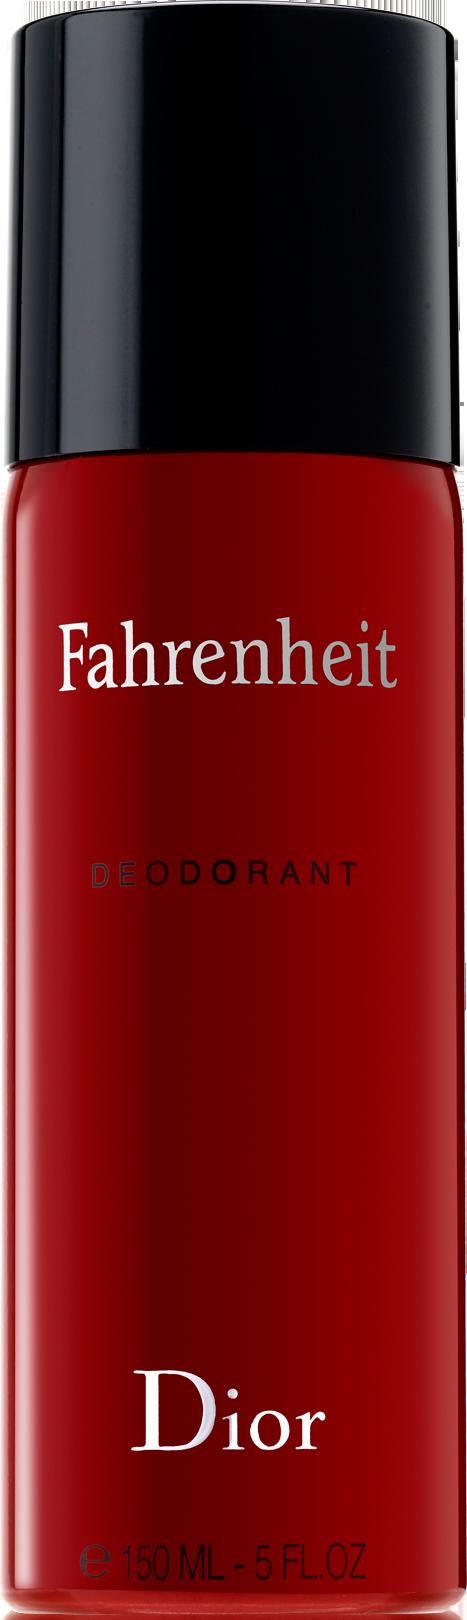 Dior Fahrenheit Deo Spray 150ml